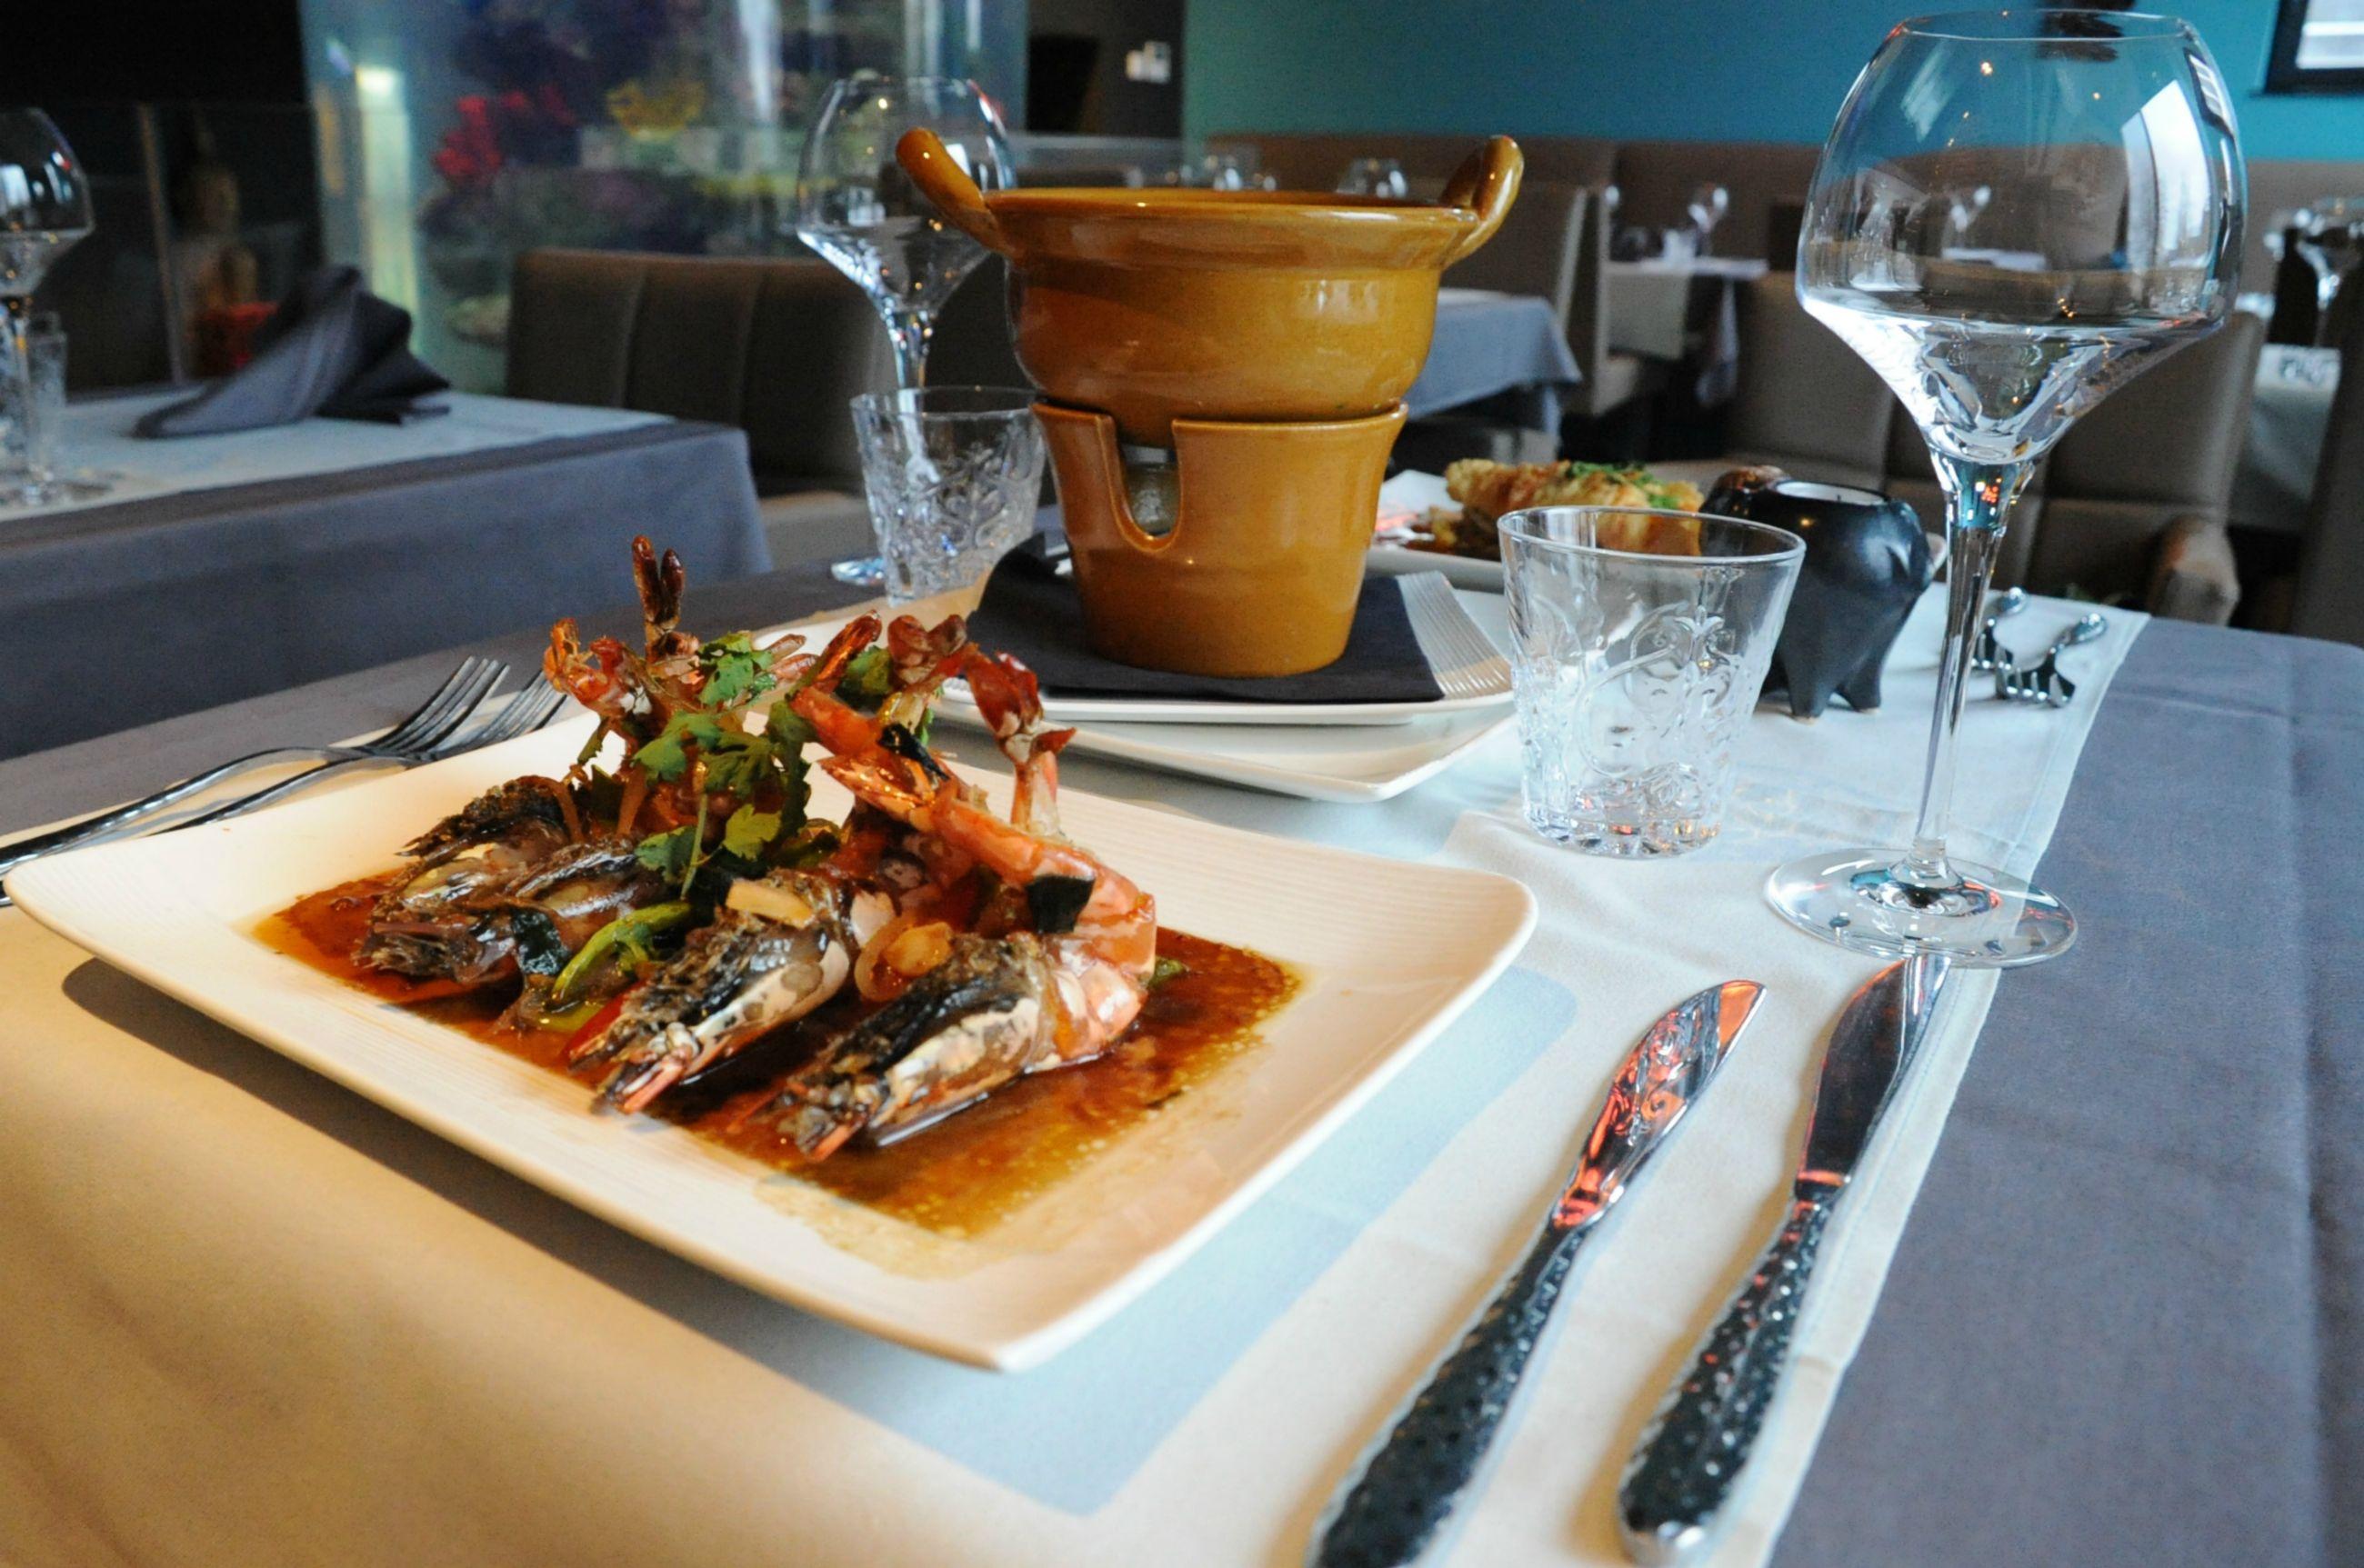 Les jardins de bangkok thai restaurant marche en for Restaurant jardin thai